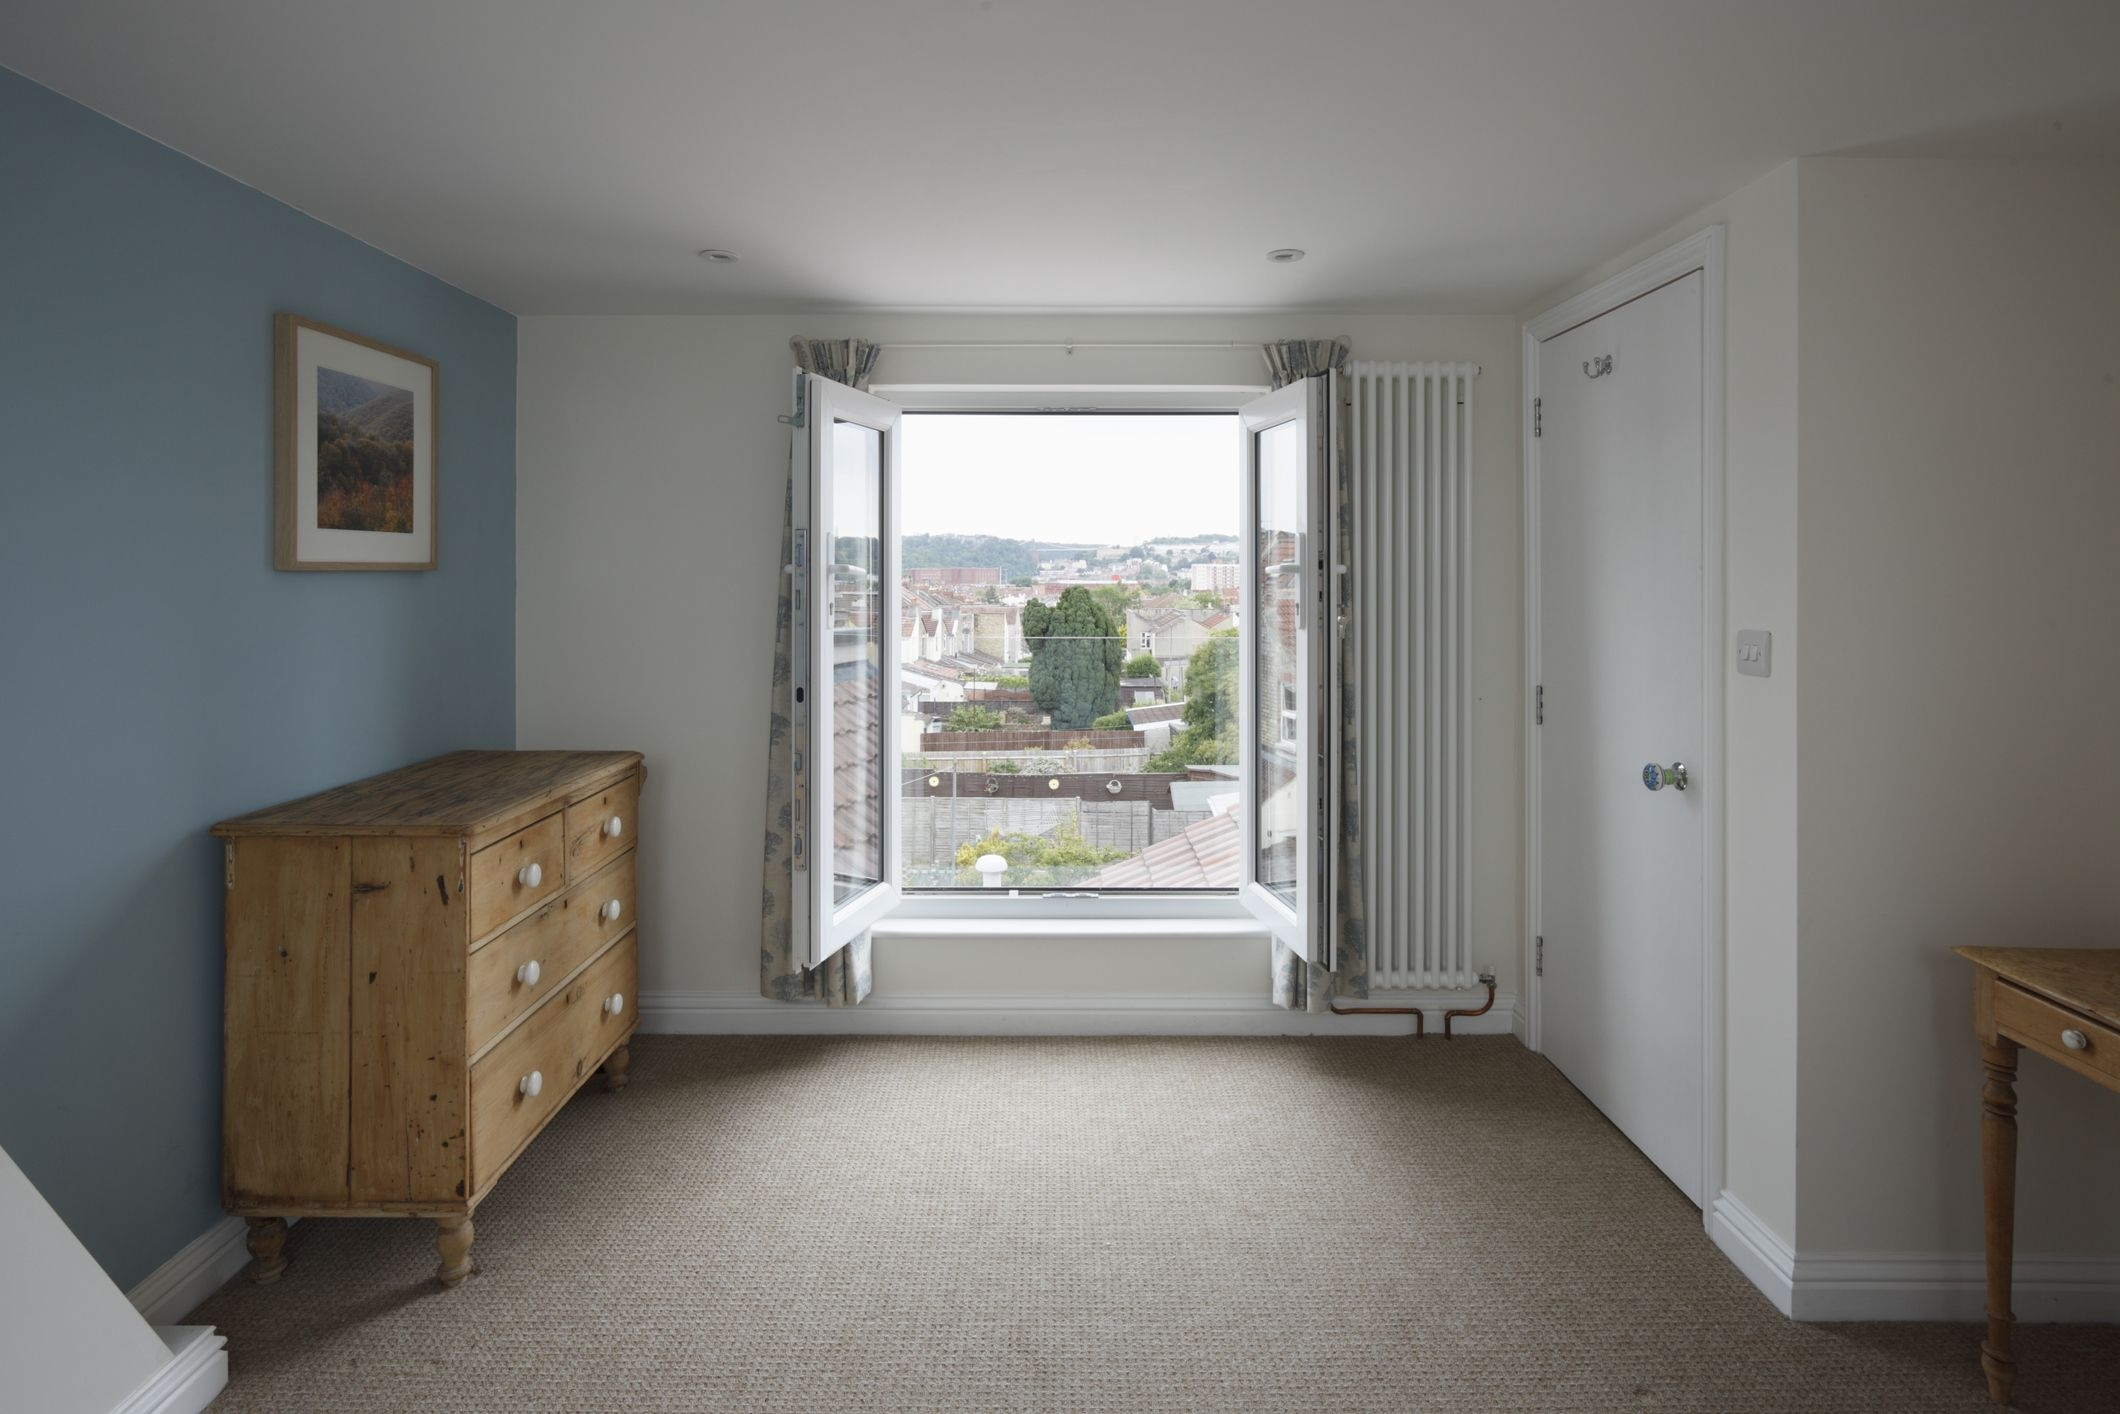 Carpet Buying Guide Bedroom Carpet Buy Carpet   Most Durable Carpet For Stairs   Hard Wearing   Laminate Flooring   Choosing   Tile   Wool